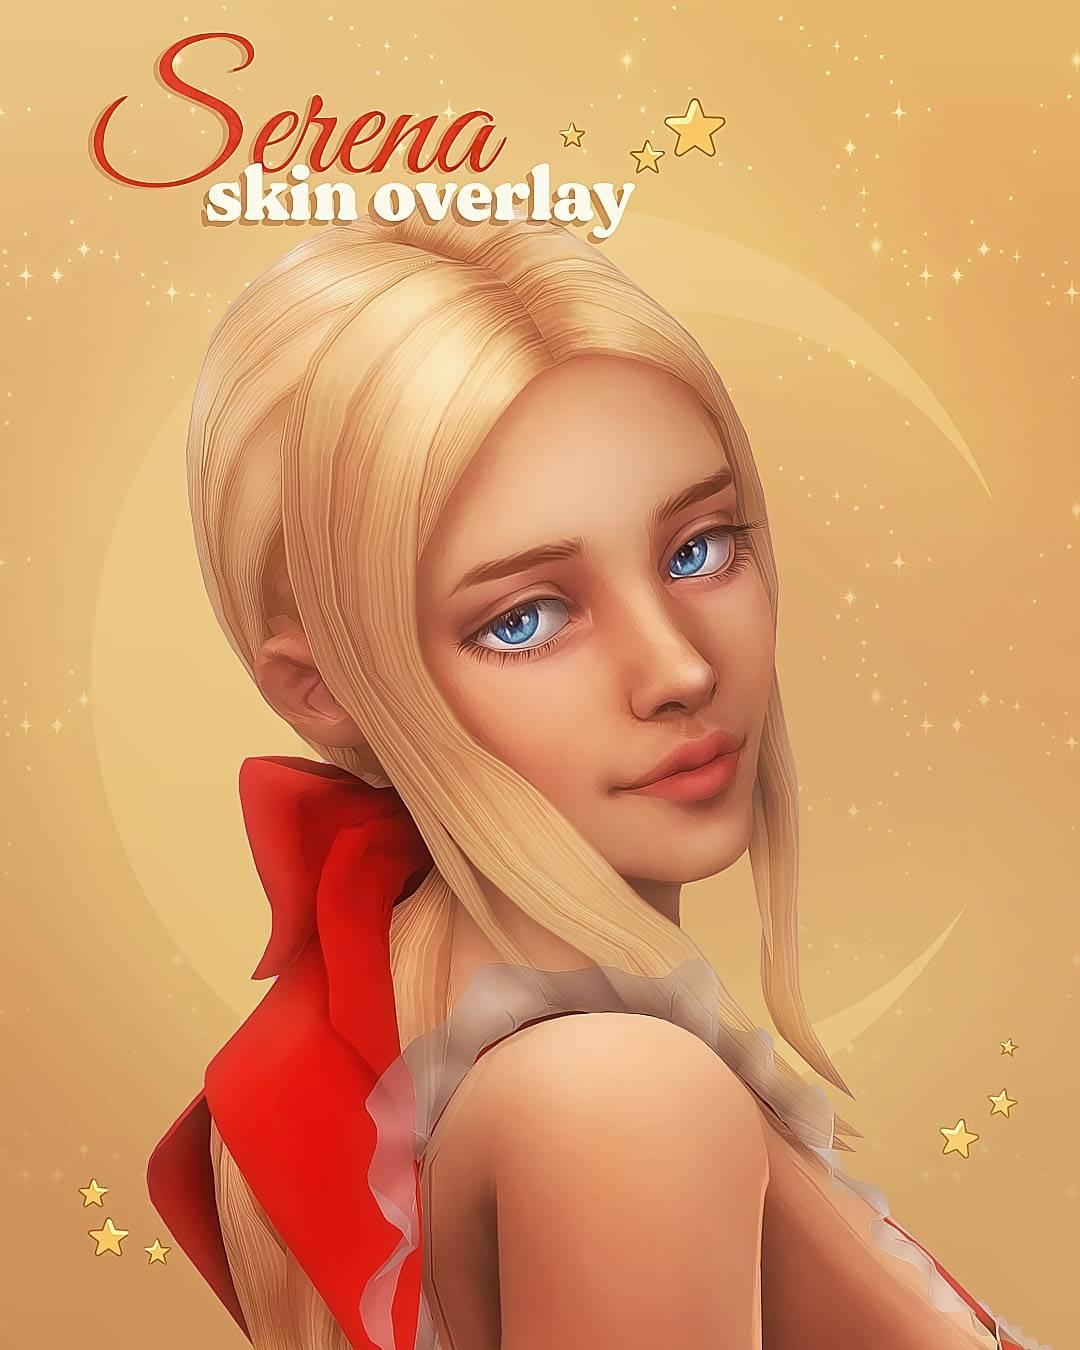 Скинтон - Serena skin overlay